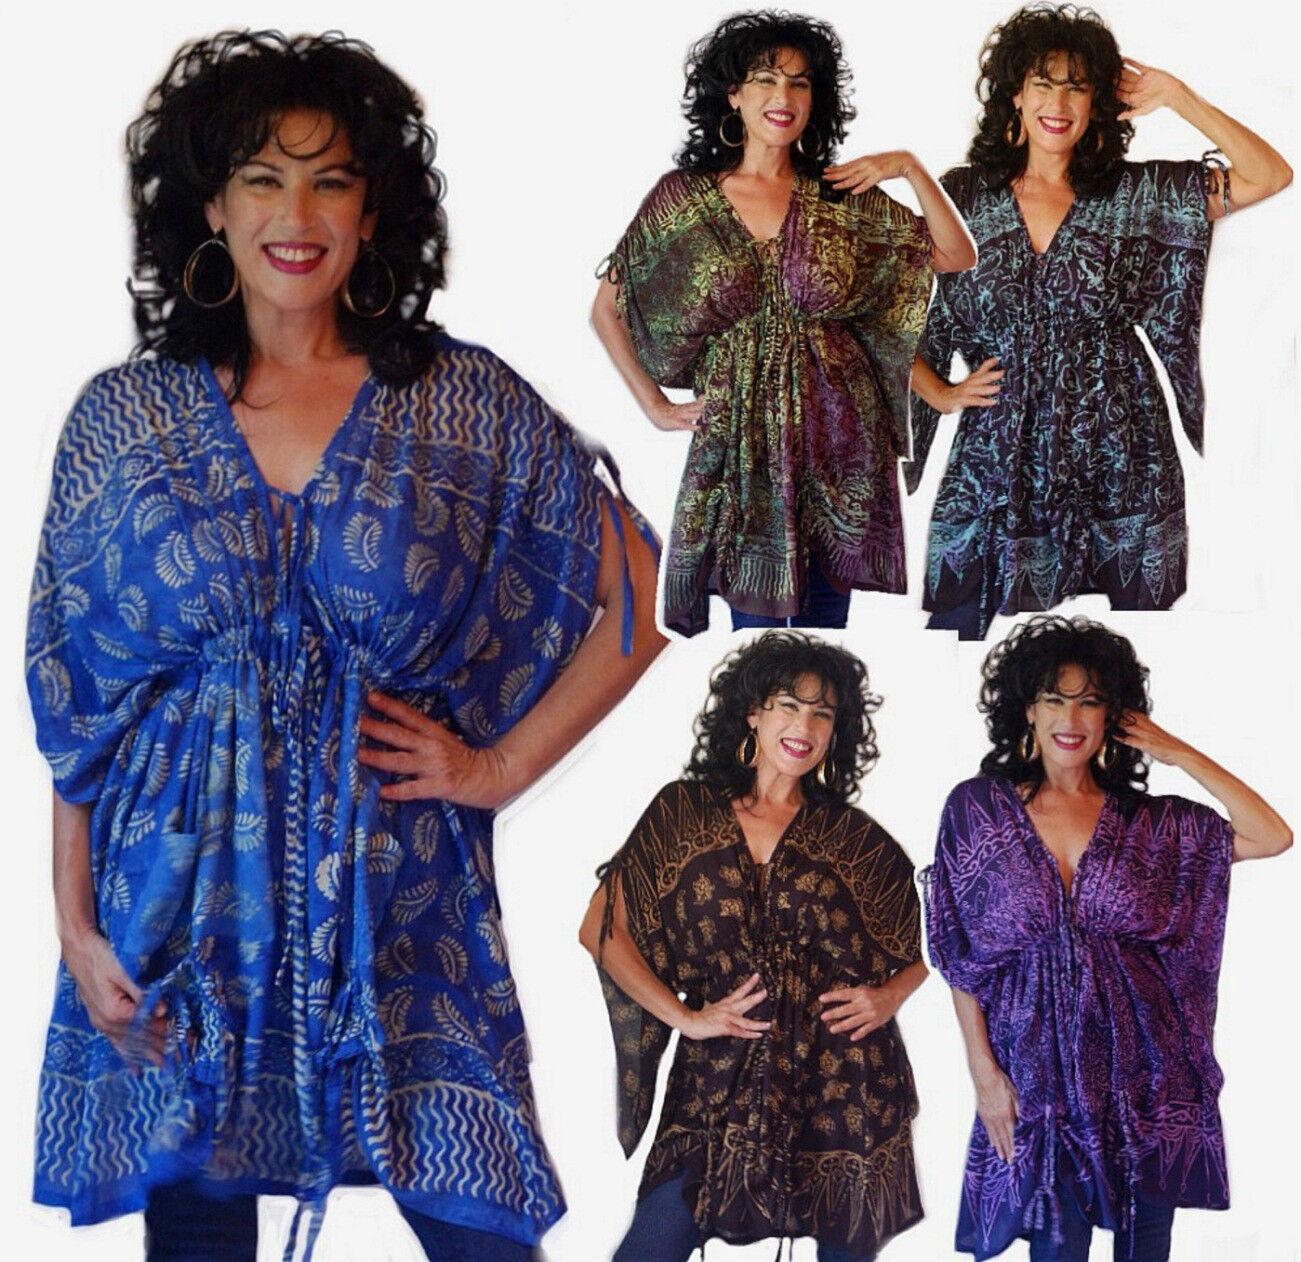 U pick Farbe & Größe poncho top batik elastic empire stunning design OS OR PLUS